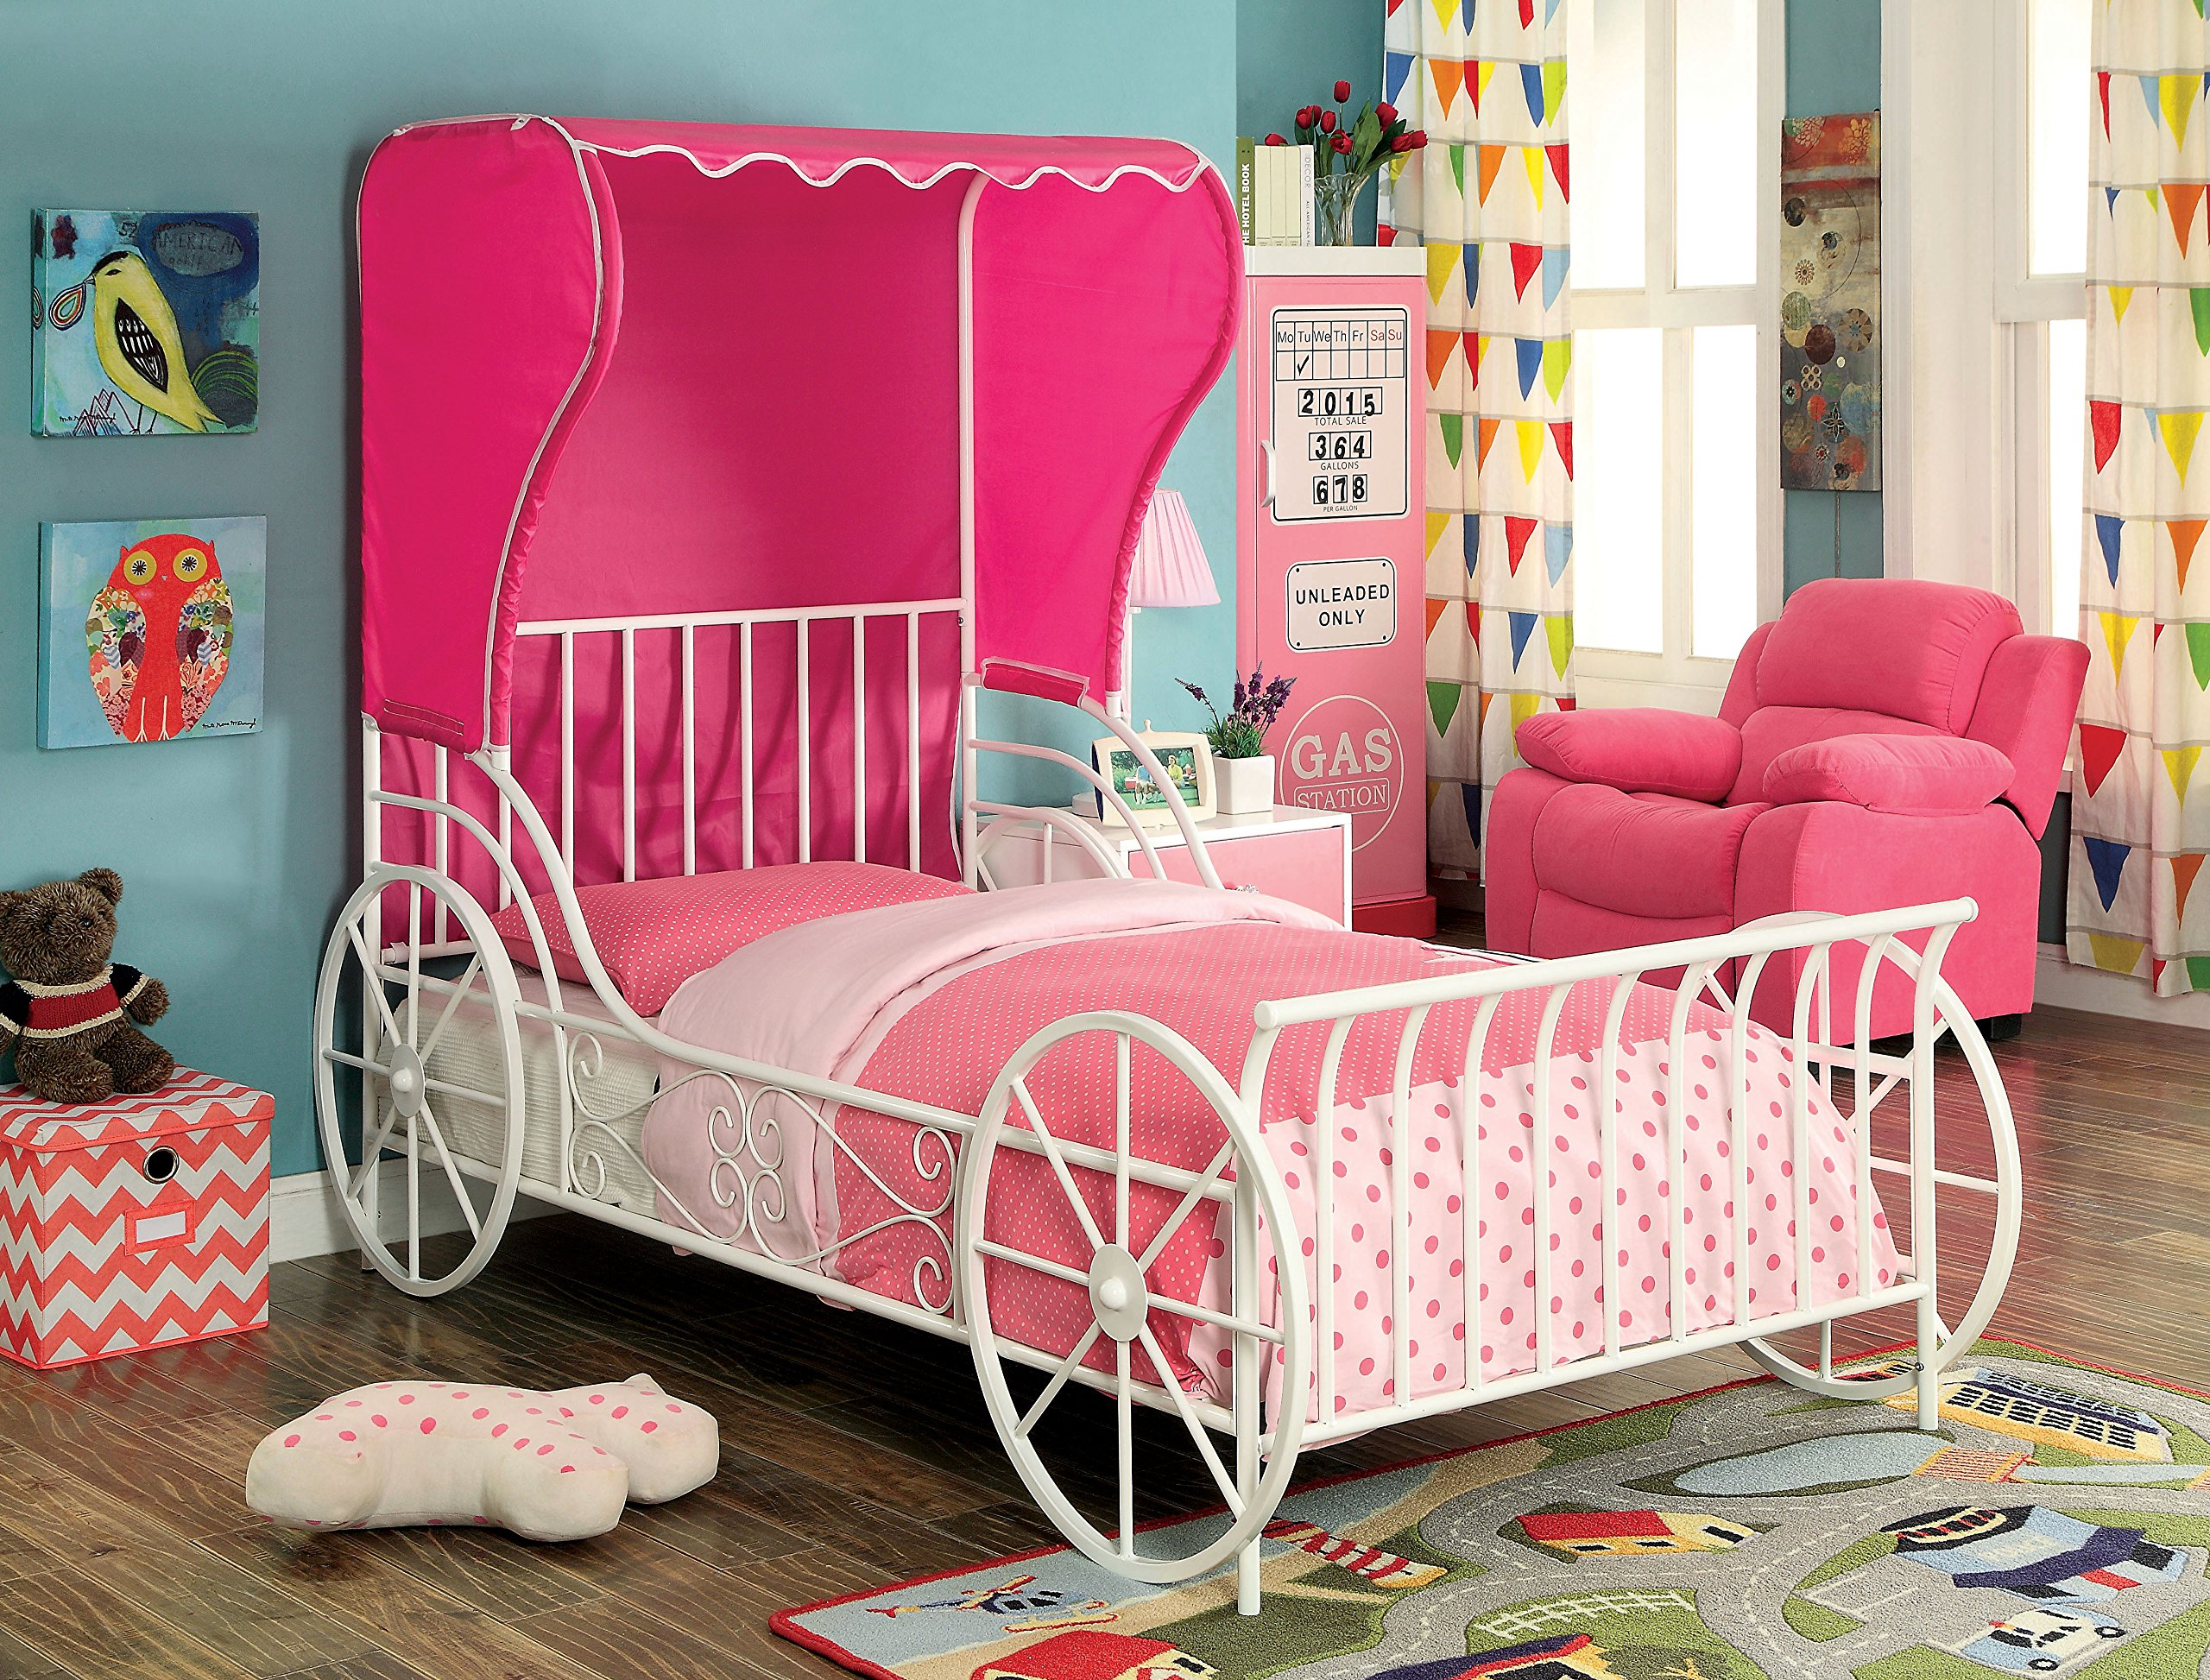 HOMES: Inside + Out IDF-7715F Rane Novelty Bed Childrens Frames, Full